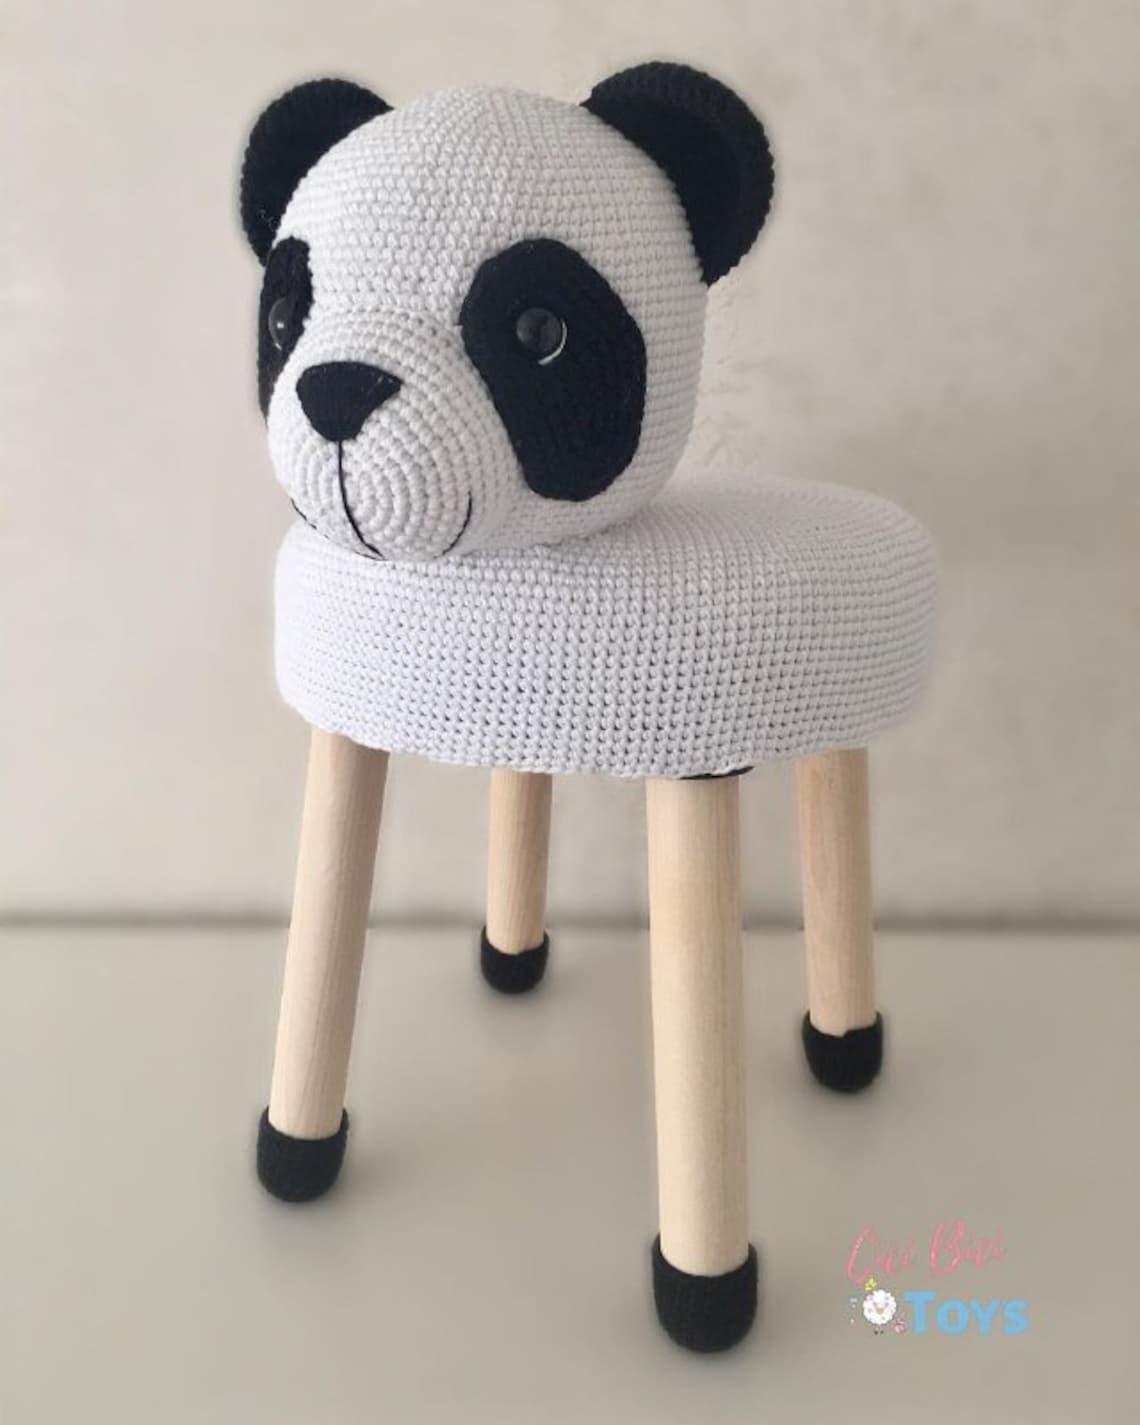 Amigurumi Children's Stool Panda Knitting Toys